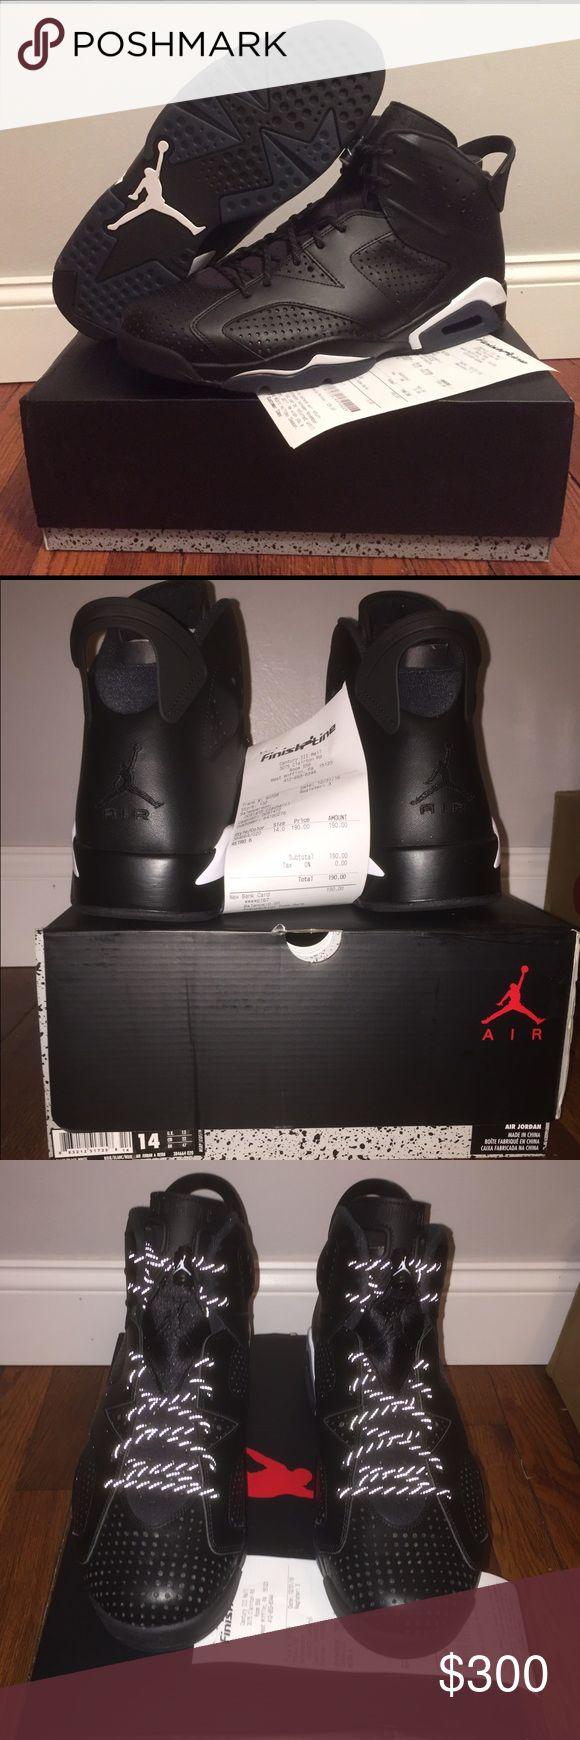 "Jordan retro 6 ""black cat"" Brand new. Ds. Never worn or tried on. Size 14 Jordan Shoes Sneakers"